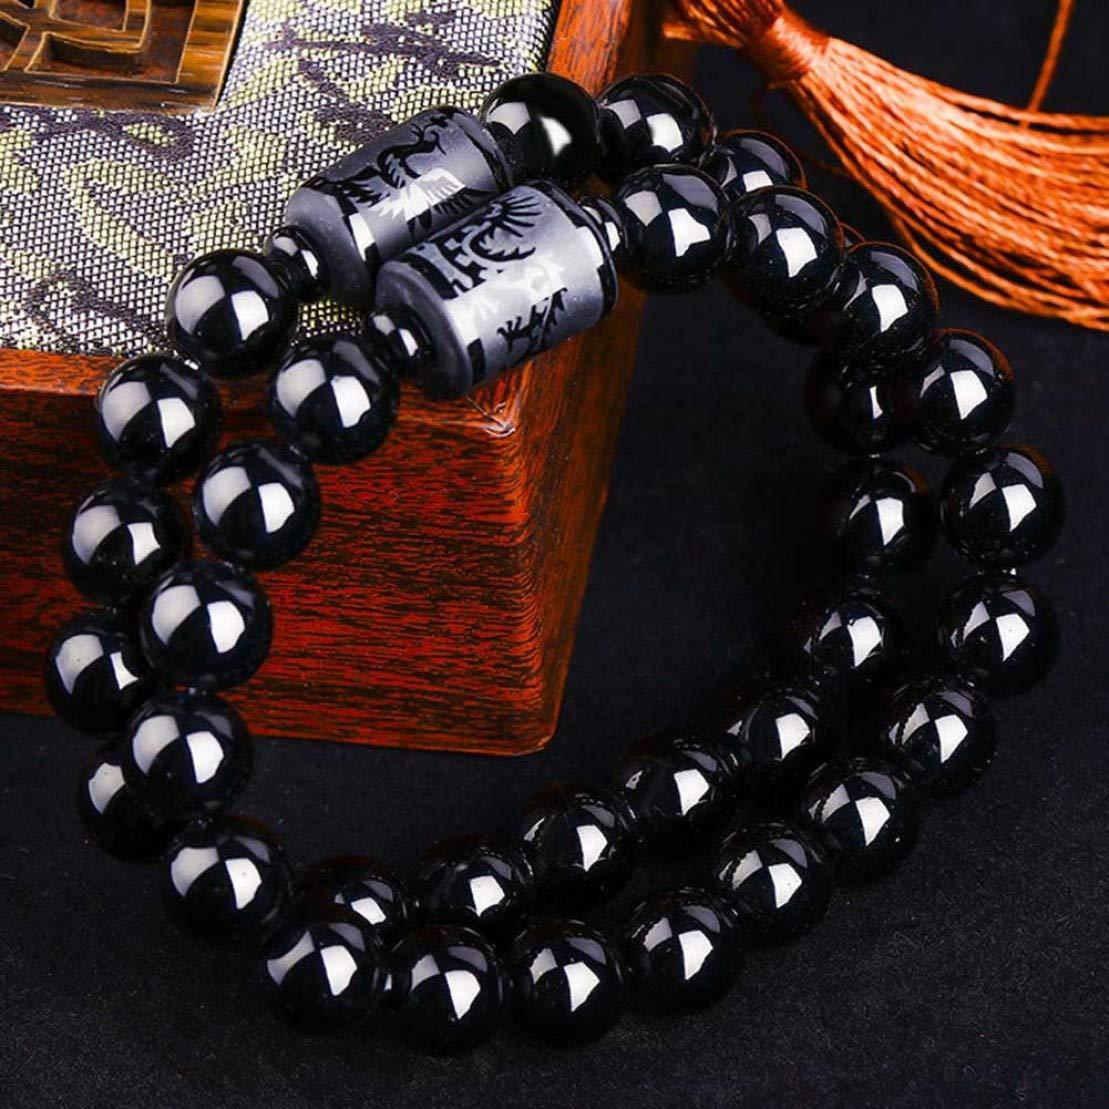 huamaojiancai Trusted Black Obsidian Crystal Dragon Bead Phoenix Strand Bracelet for Men Women Couples Bracelets Lucky Jewelry Gifts